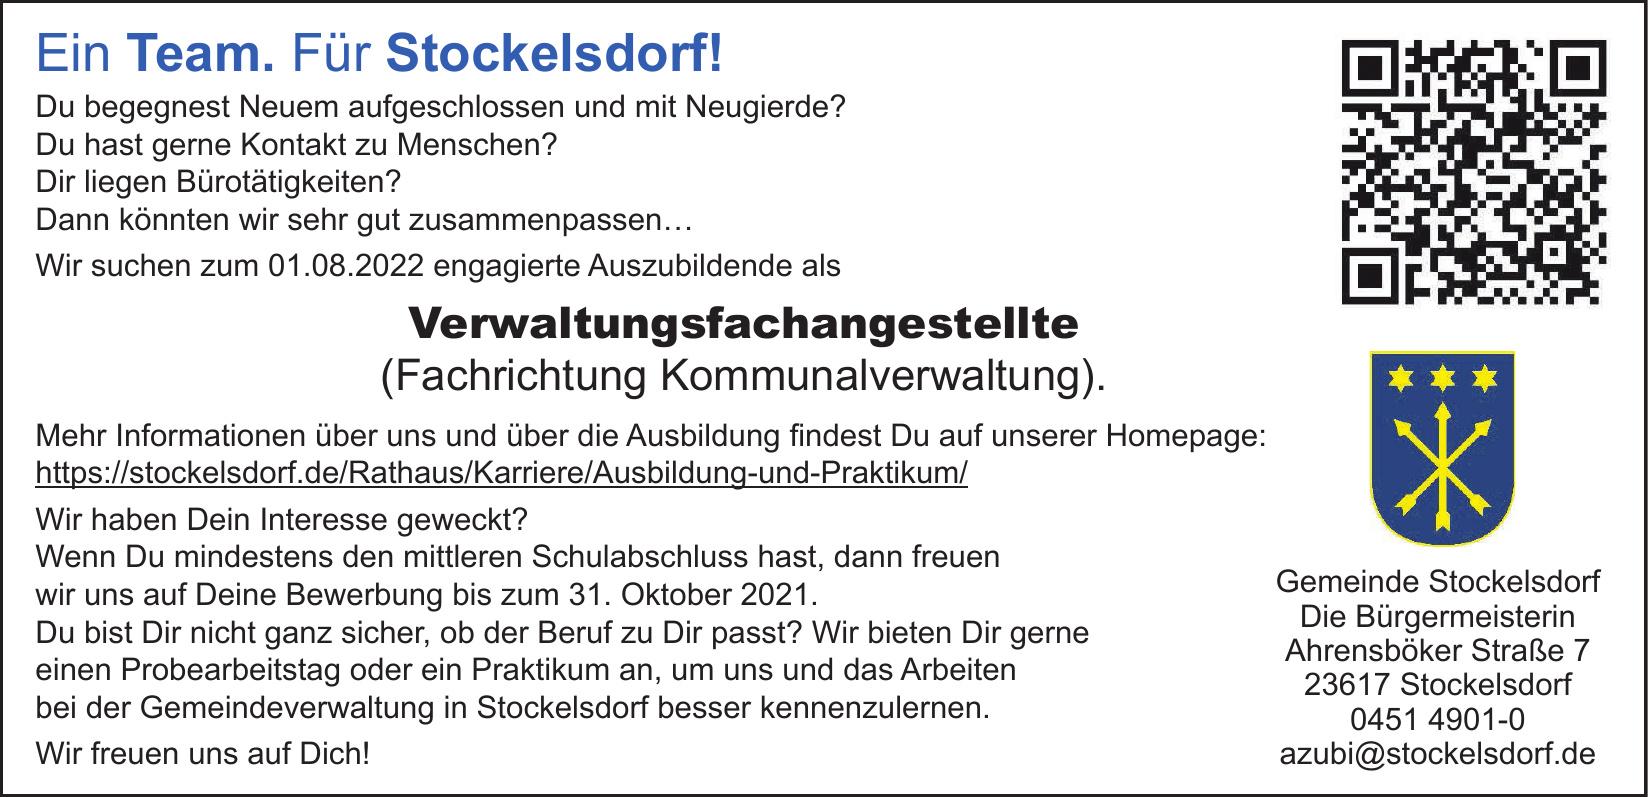 Gemeinde Stockelsdorf